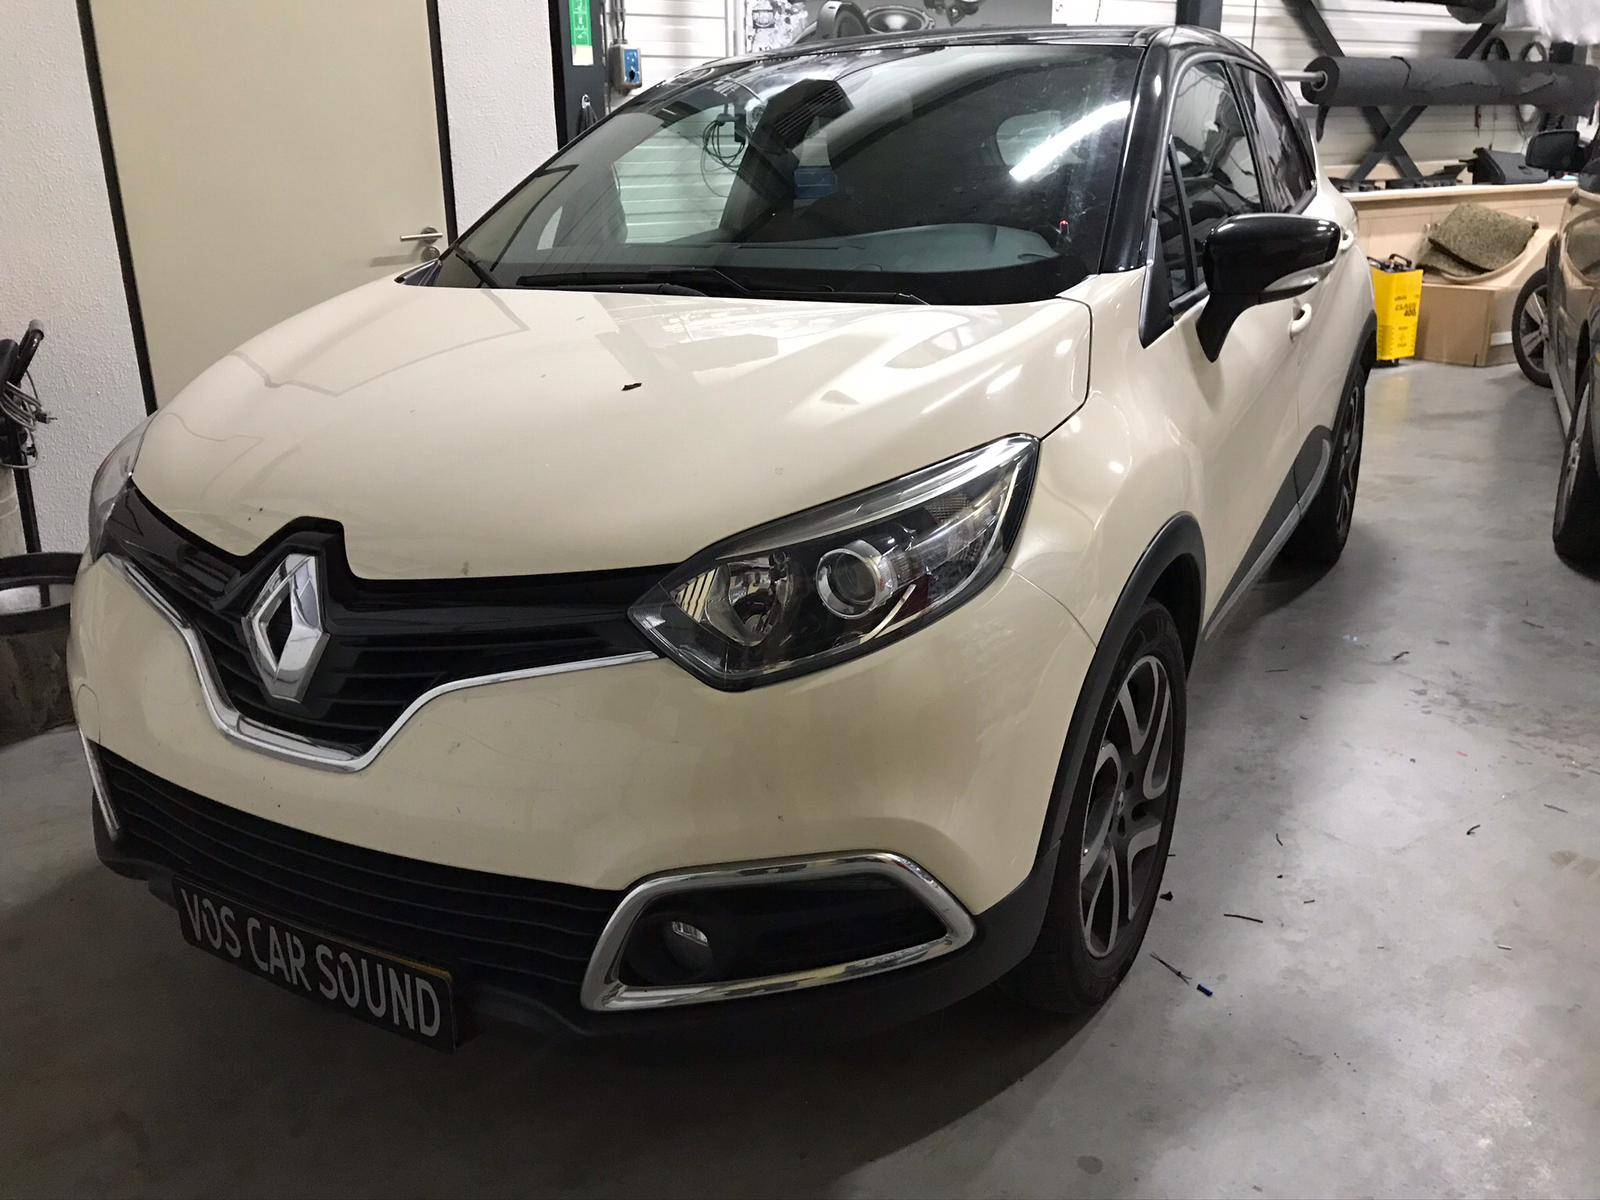 Renault qaptur - Alarmssysteem